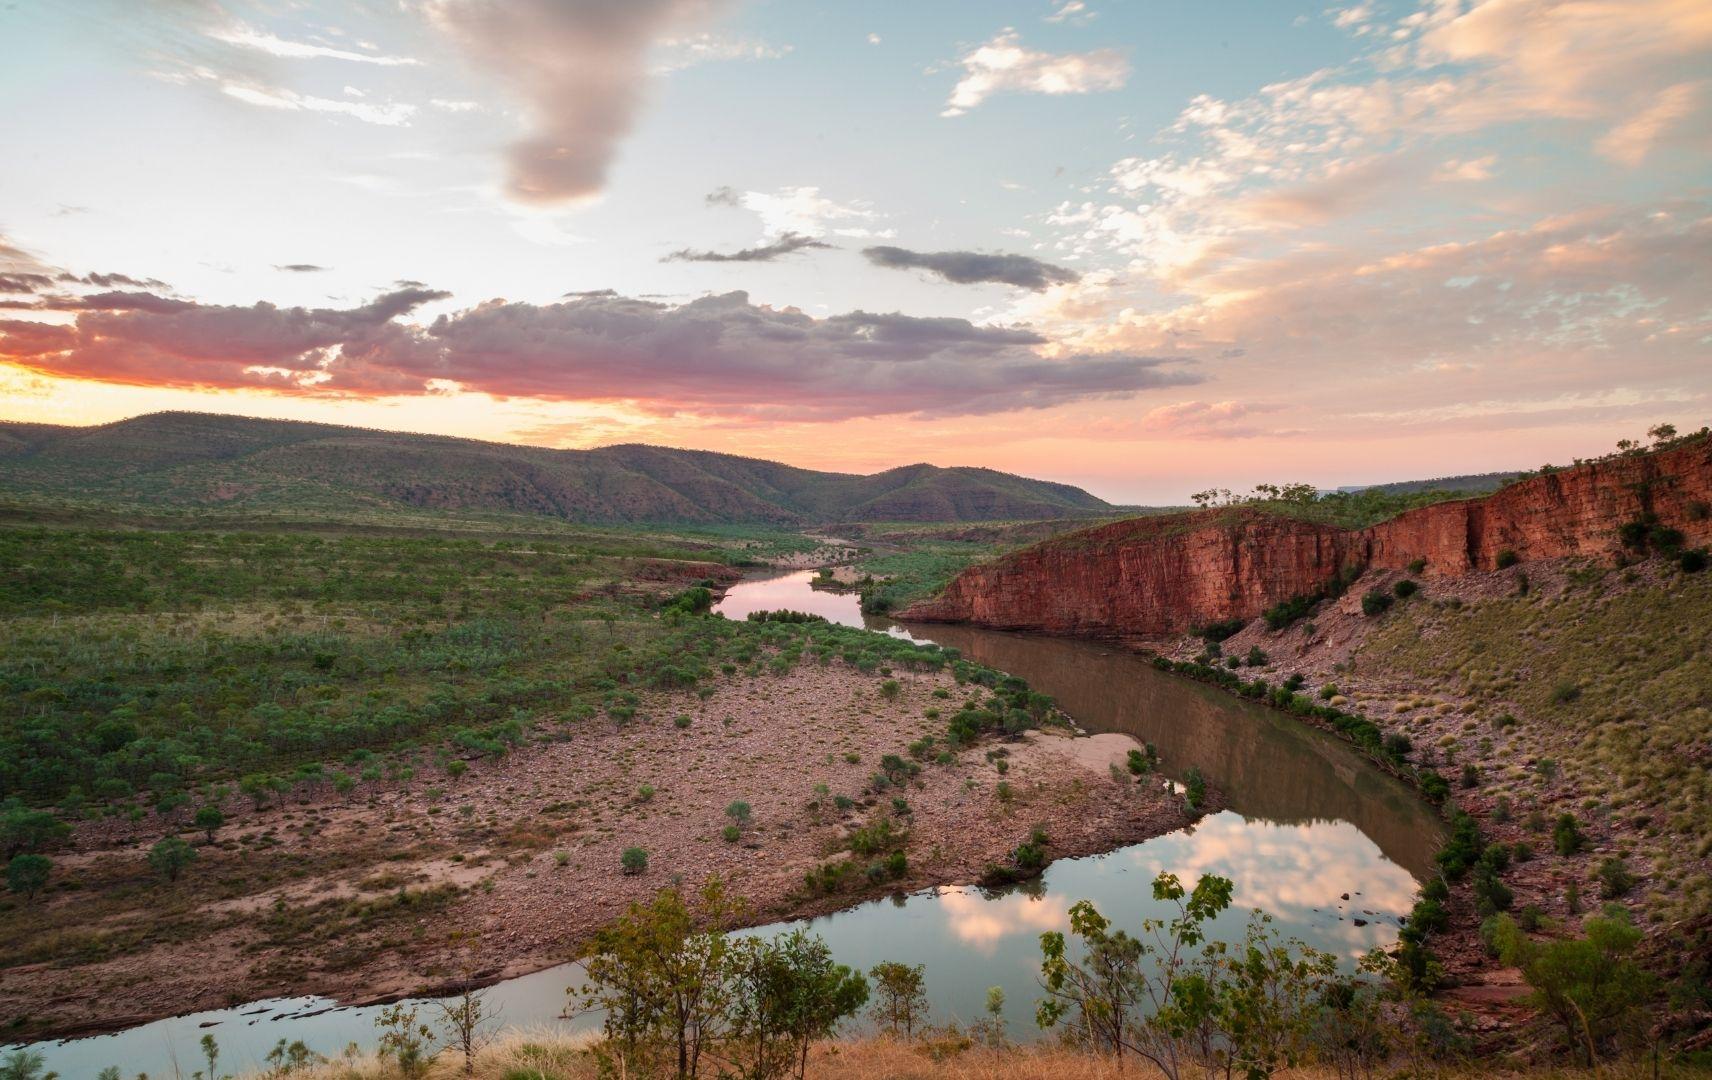 Fernreise Australien - Kimberley Landschaft